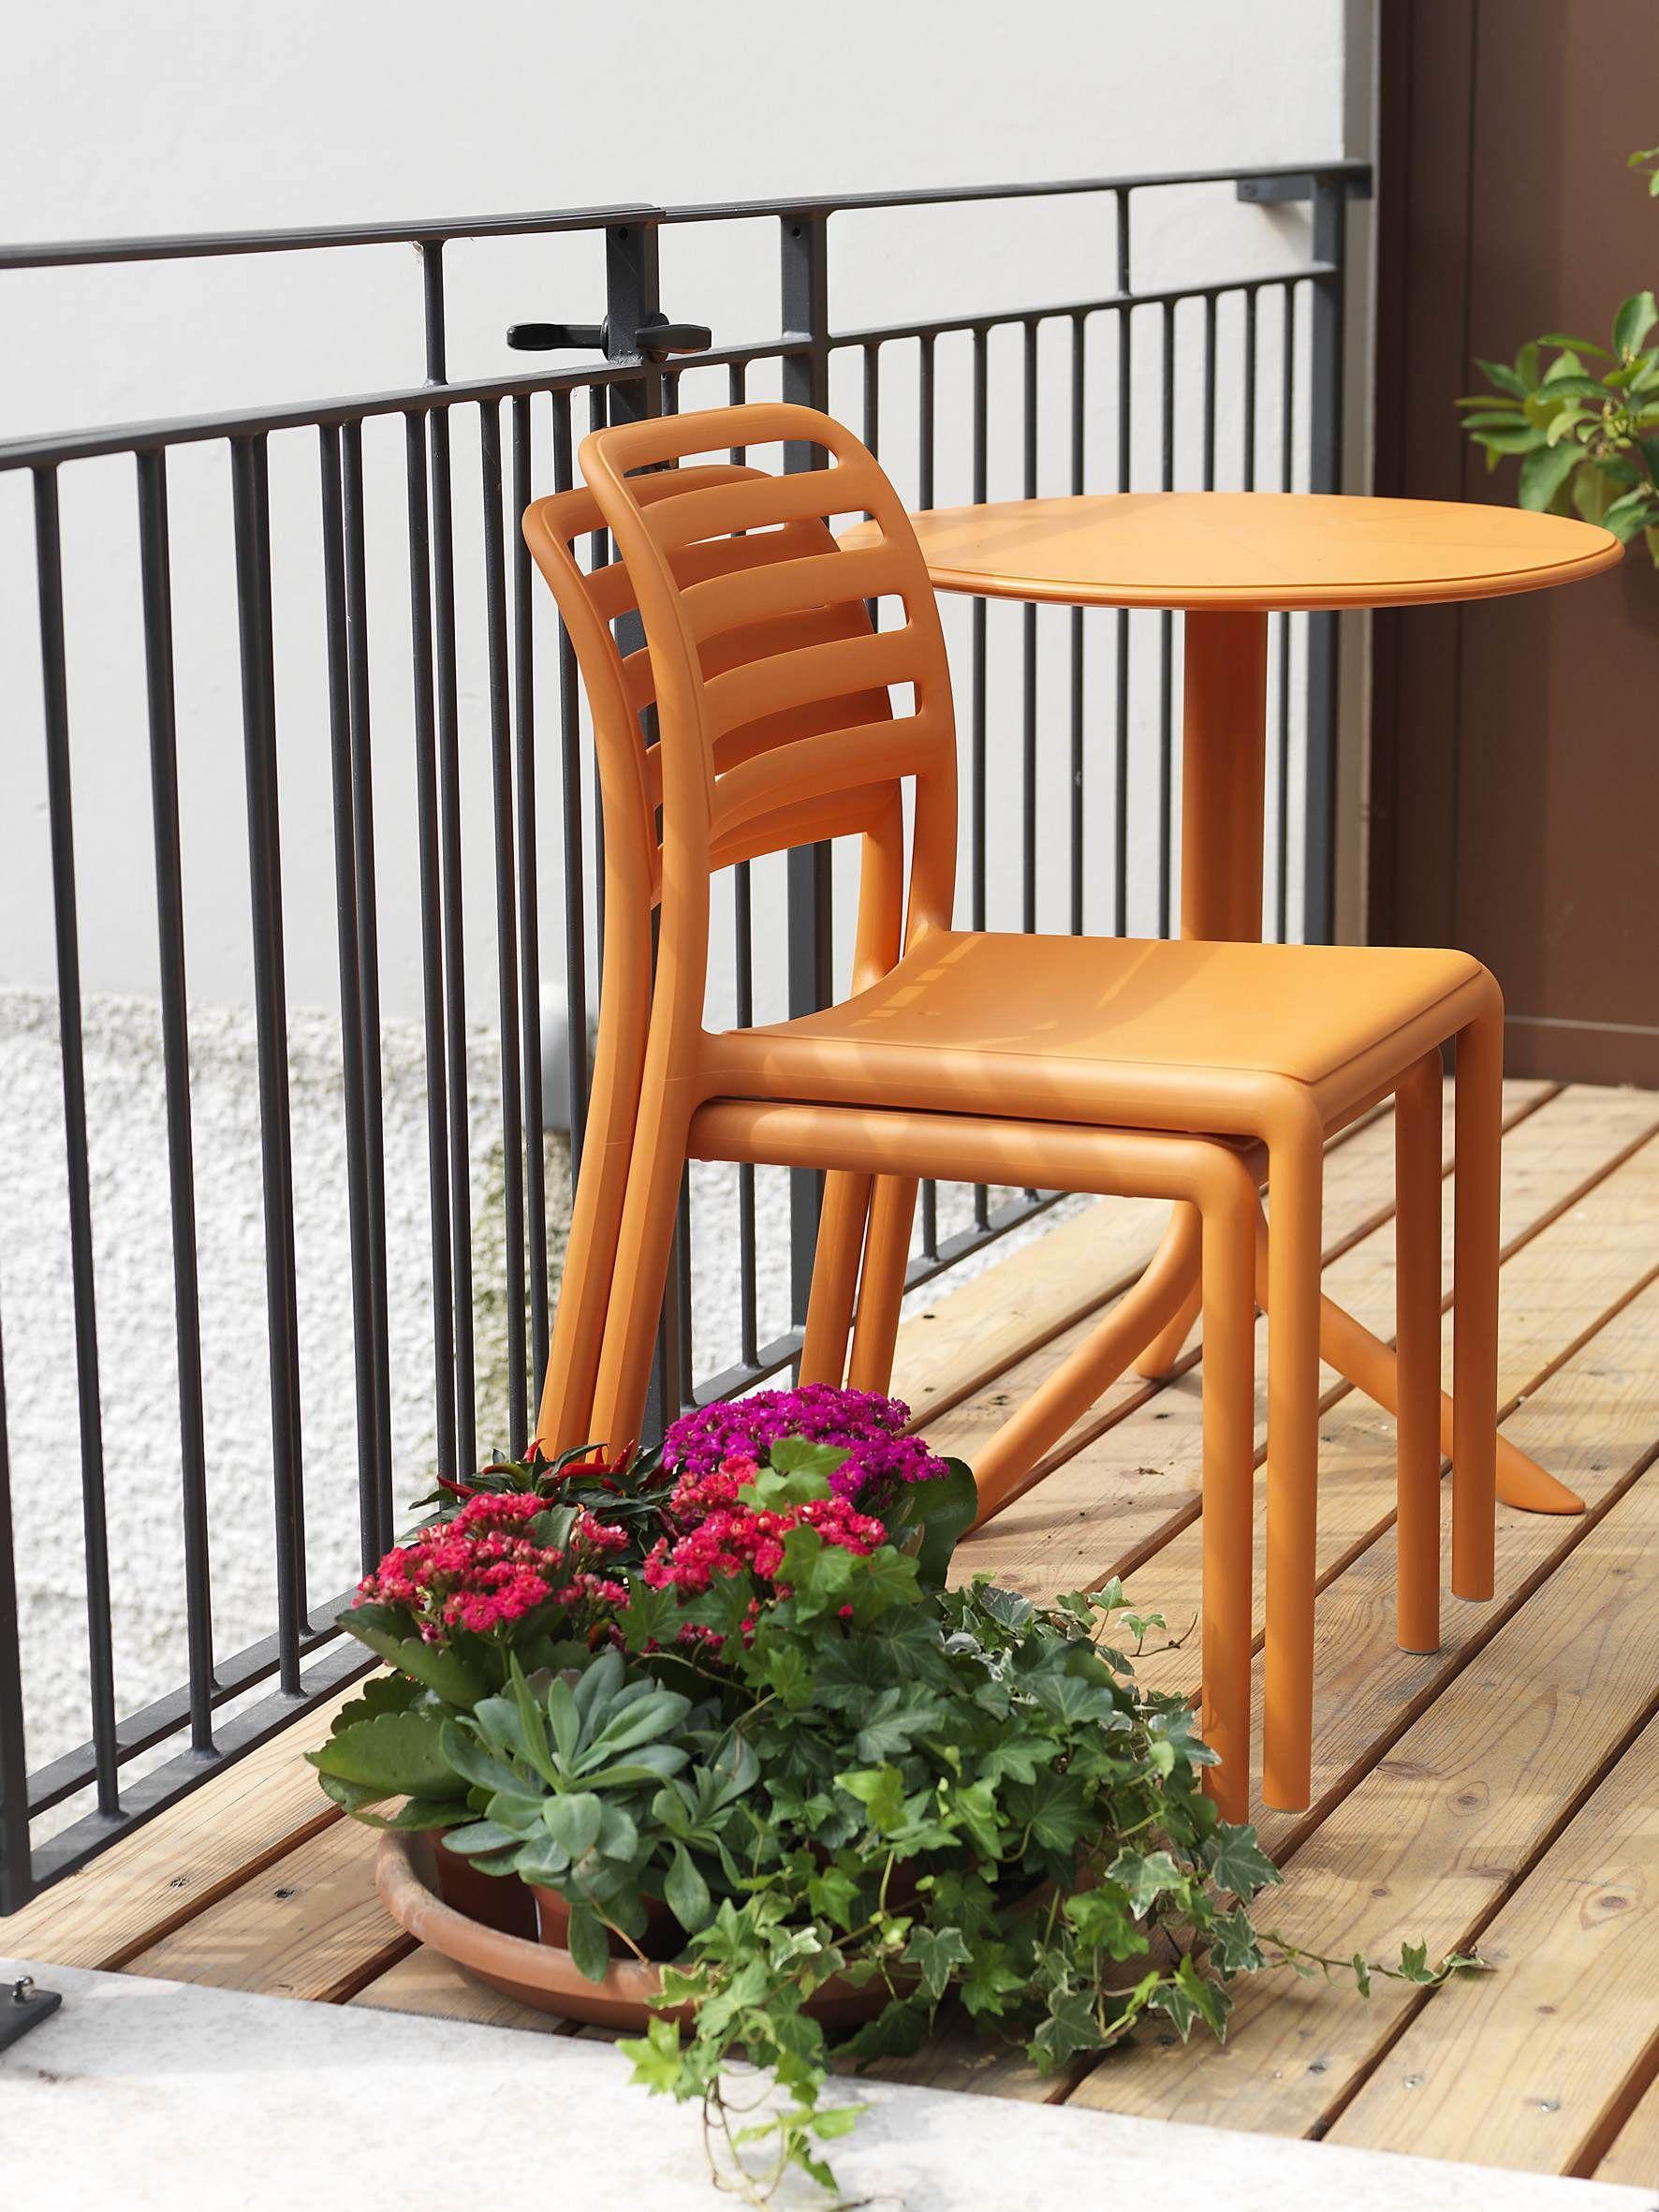 #Garden furniture ideas by Nardi outdoors